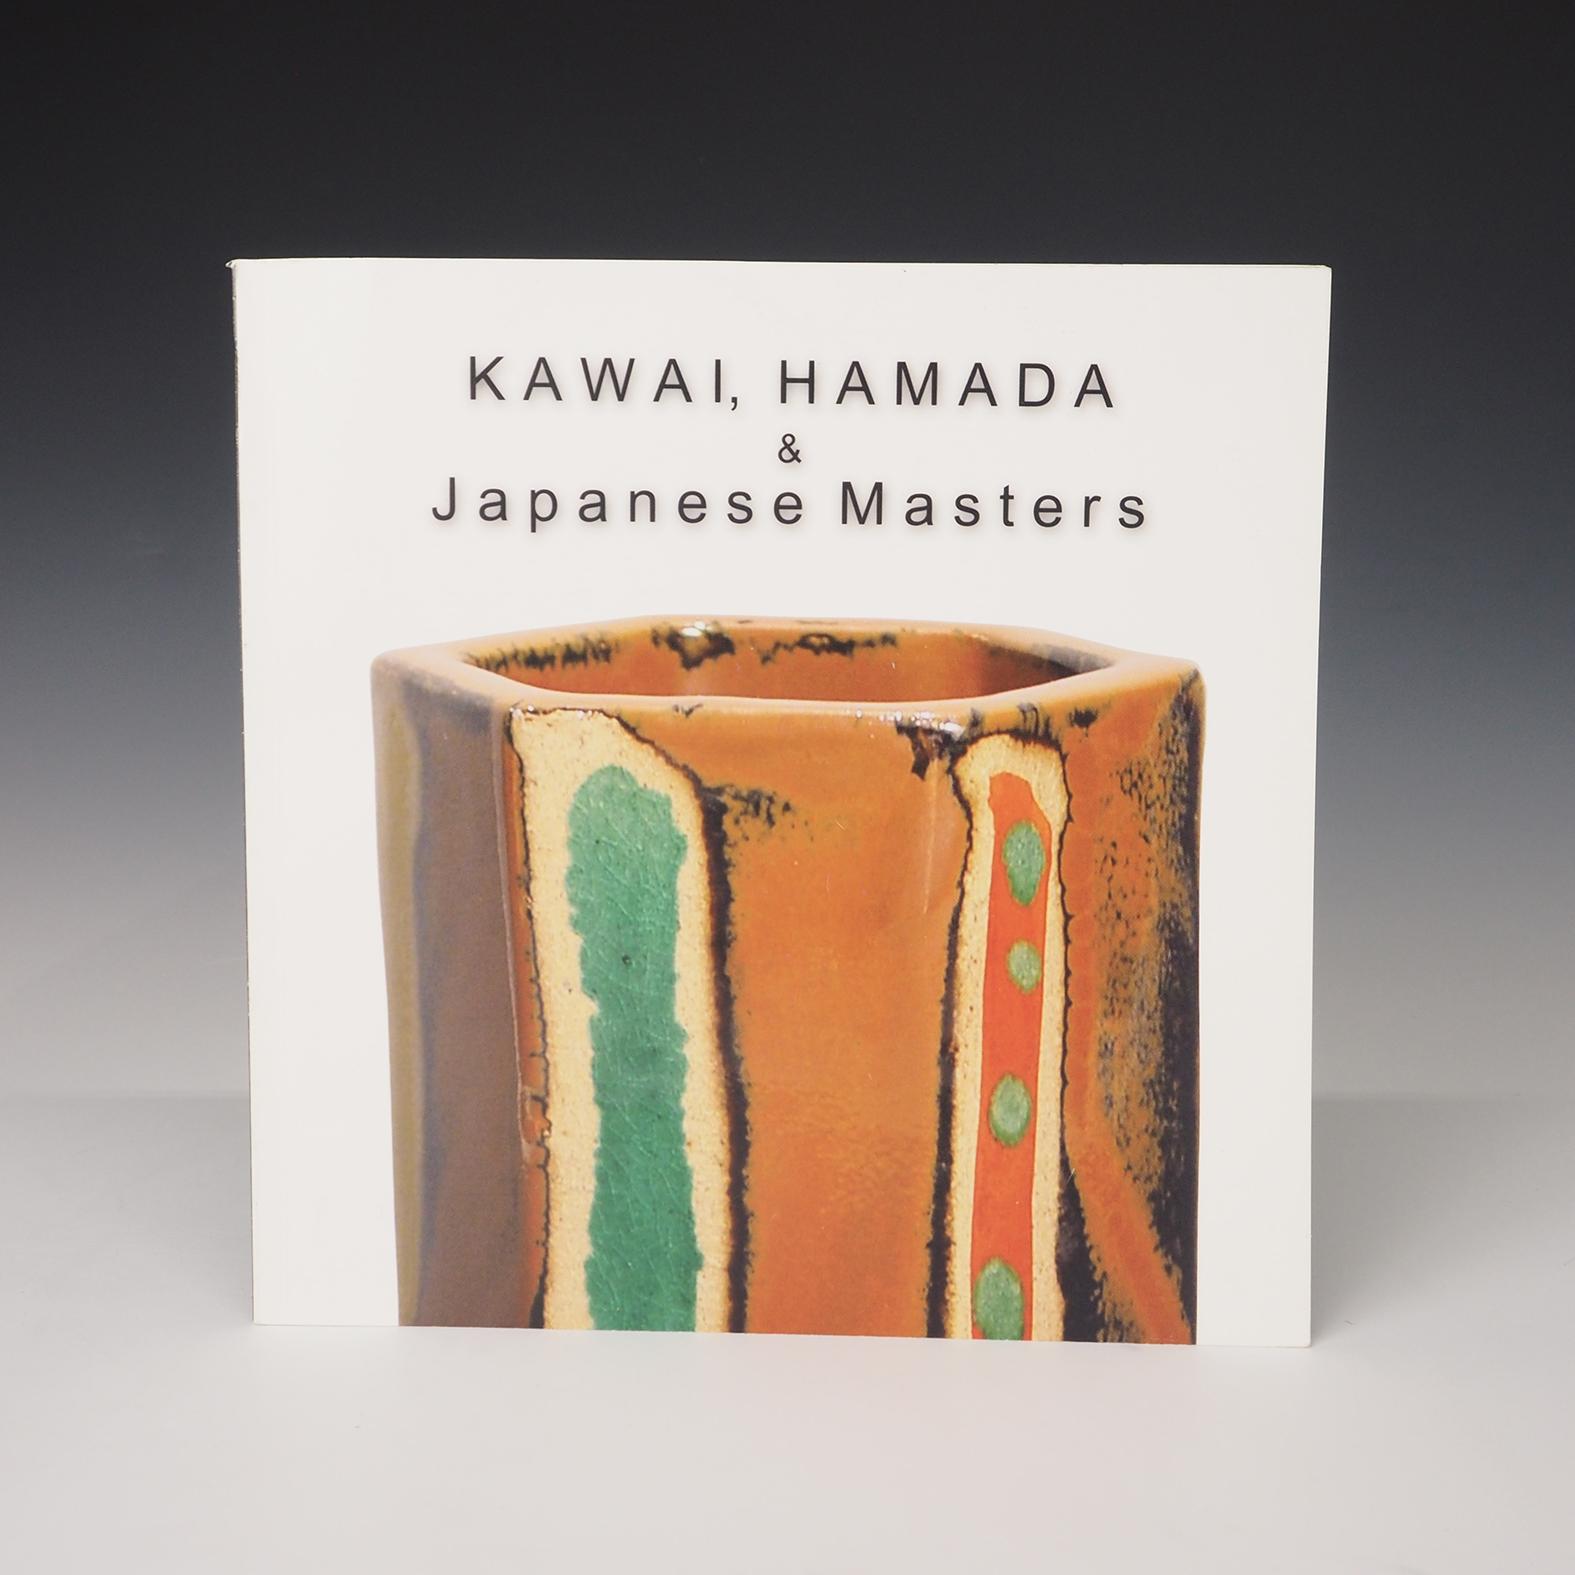 "Kawai, Hamada & Japanese Masters    Dai Ichi Arts, 2003. 8½"" x 8½"", 44pp. This mini catalog features signature works by Japanese master pottery artists such as Kanjiro Kawai and Shoji Hamada along with contemporary Japanese ceramic artists such as Yuriko Matsuda, Harumi Nakashima, Shigemasa Higashida, etc."